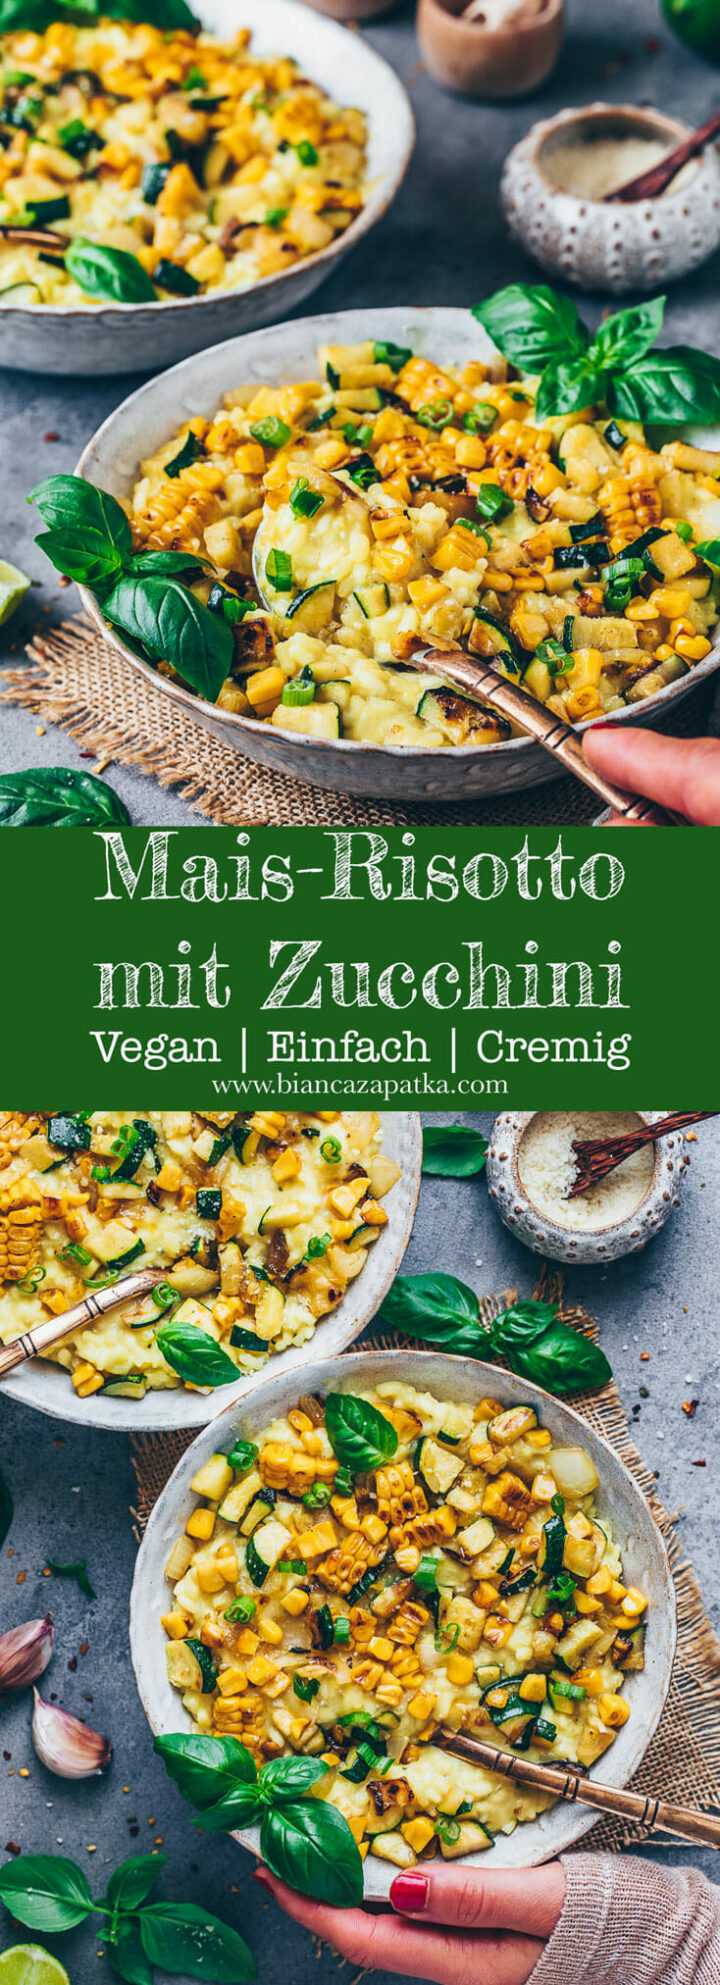 Cremiges Risotto mit Mais, Zucchini, Basilikum, Parmesan, Knoblauch